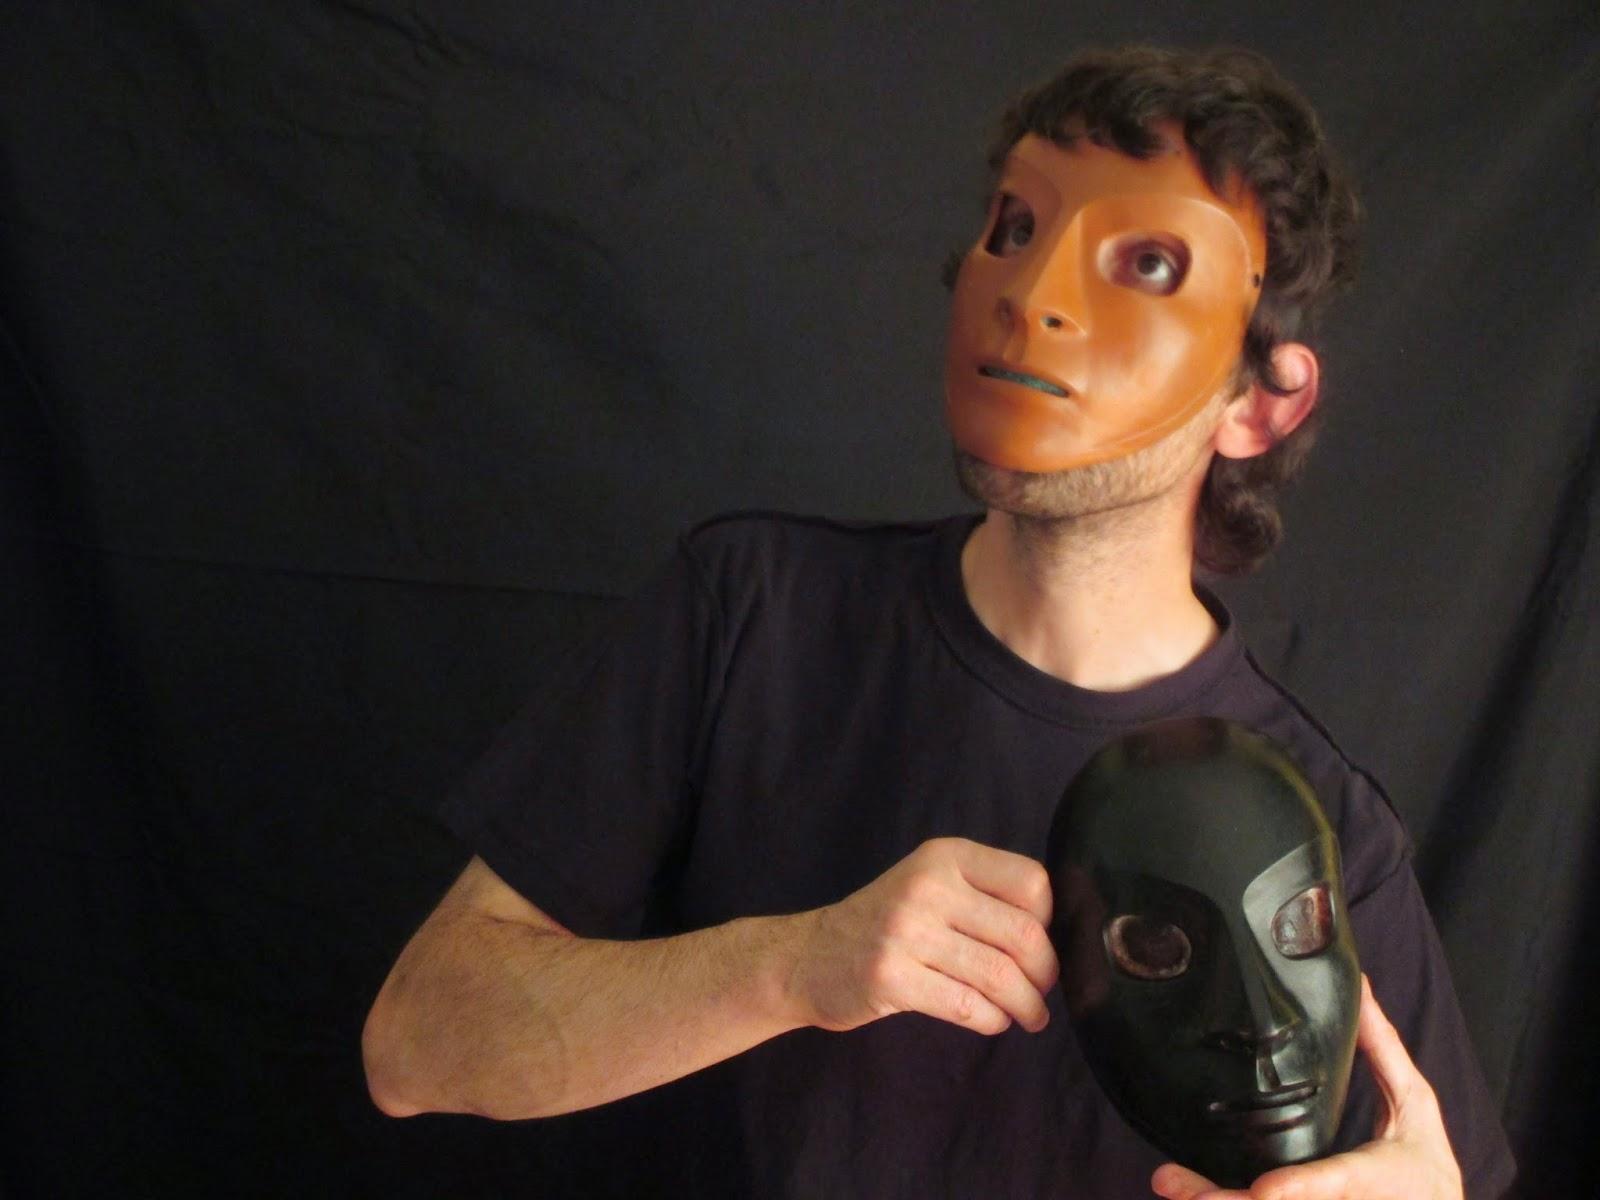 expressive mask, larval mask, larvarias, lecoq, máscara neutra, mascaras expresivas, máscaras pedagogicas, mask maker, masque neutre, masques expressifs, neutral mask, teatro, theatrical mask